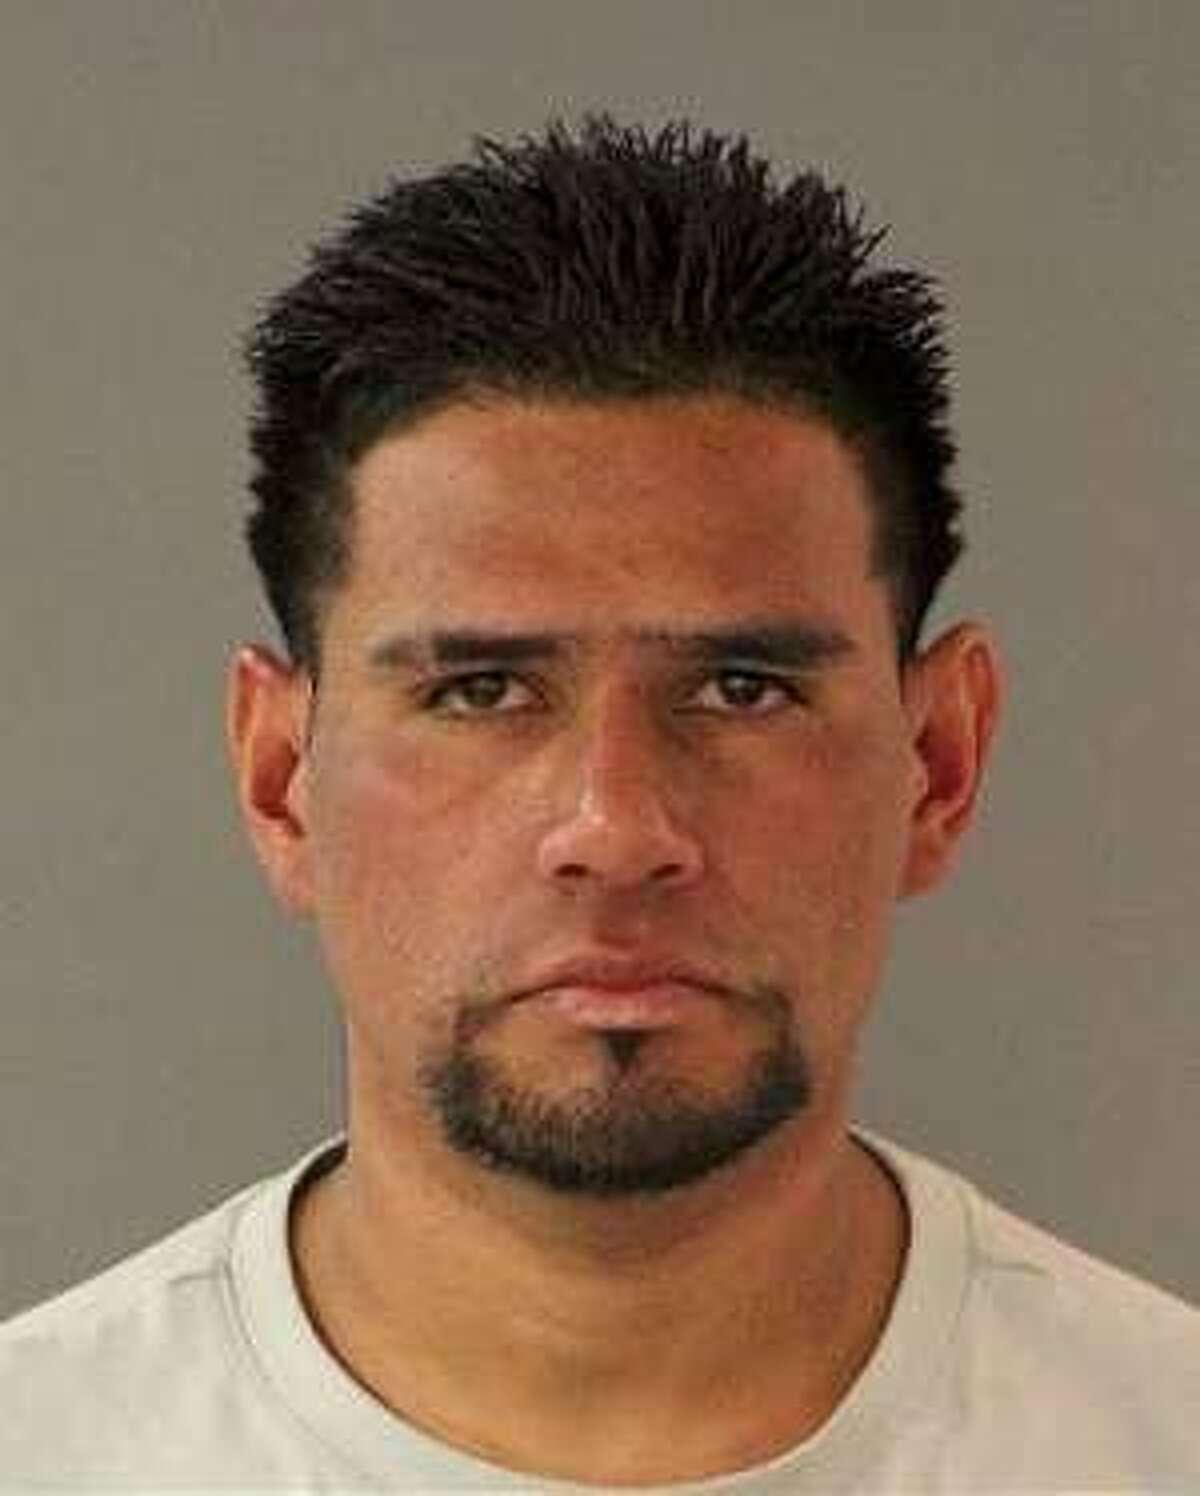 San Jose police arrested CarlosEduardo Arevalo Carranza on Monday on suspicion of murder in the Feb. 28 stabbing death of Bambi Larson.